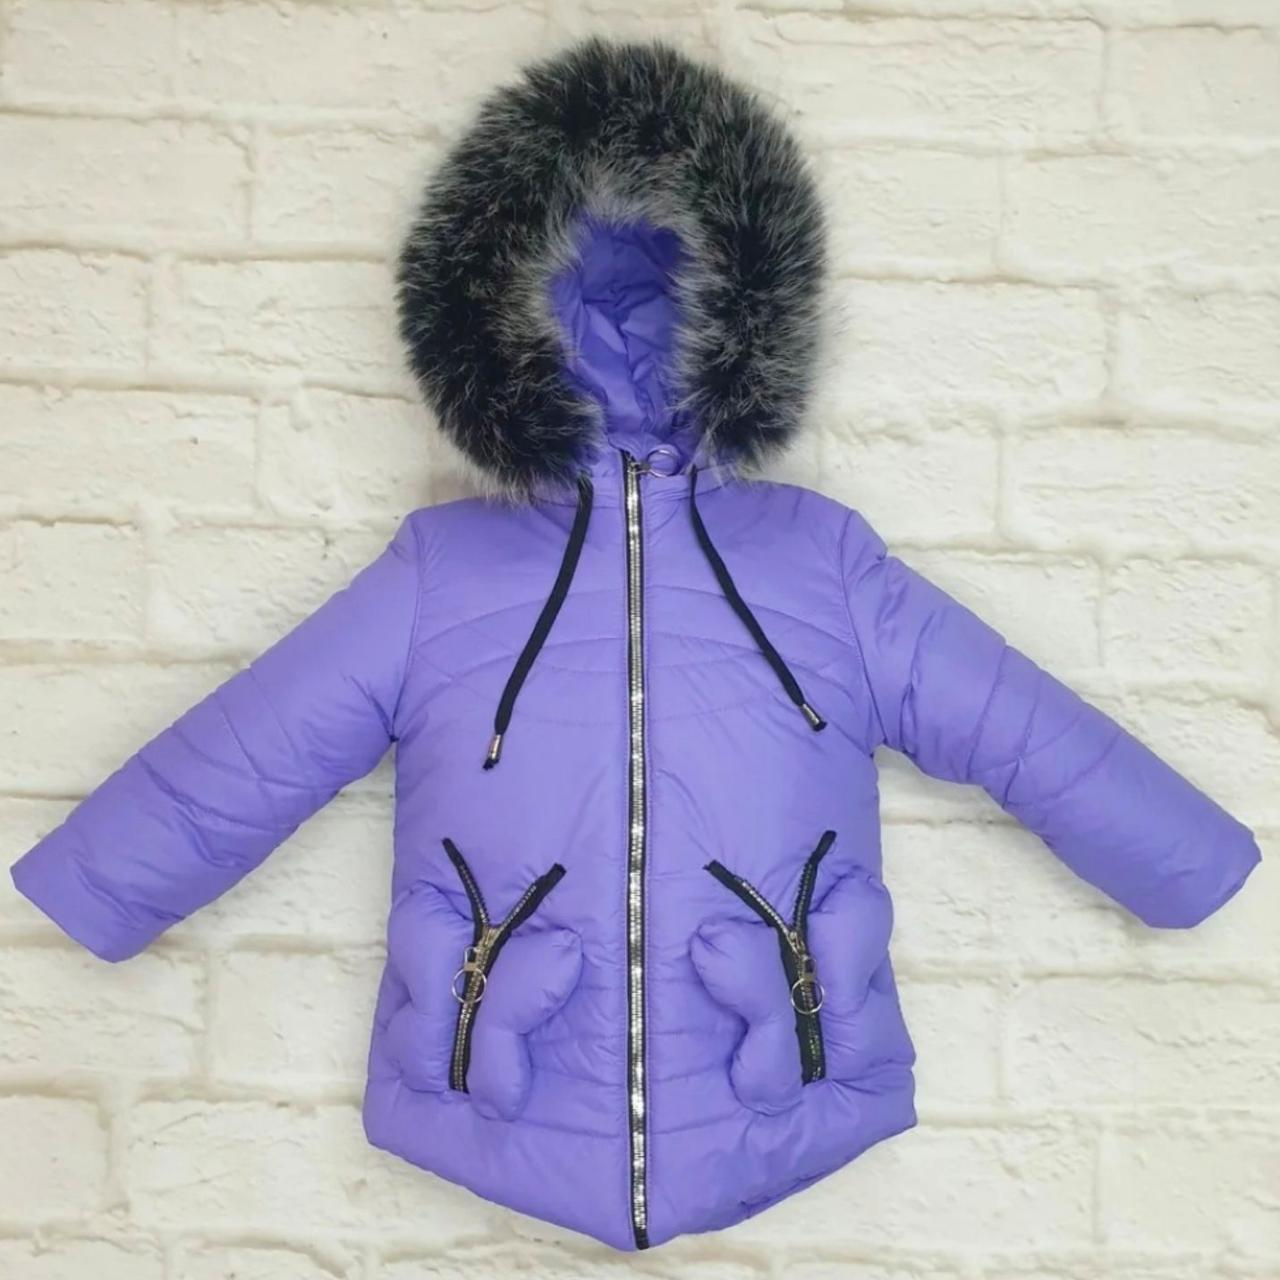 Зимняя куртка на девочку 26,28 размер (1-2, 2-3 года)